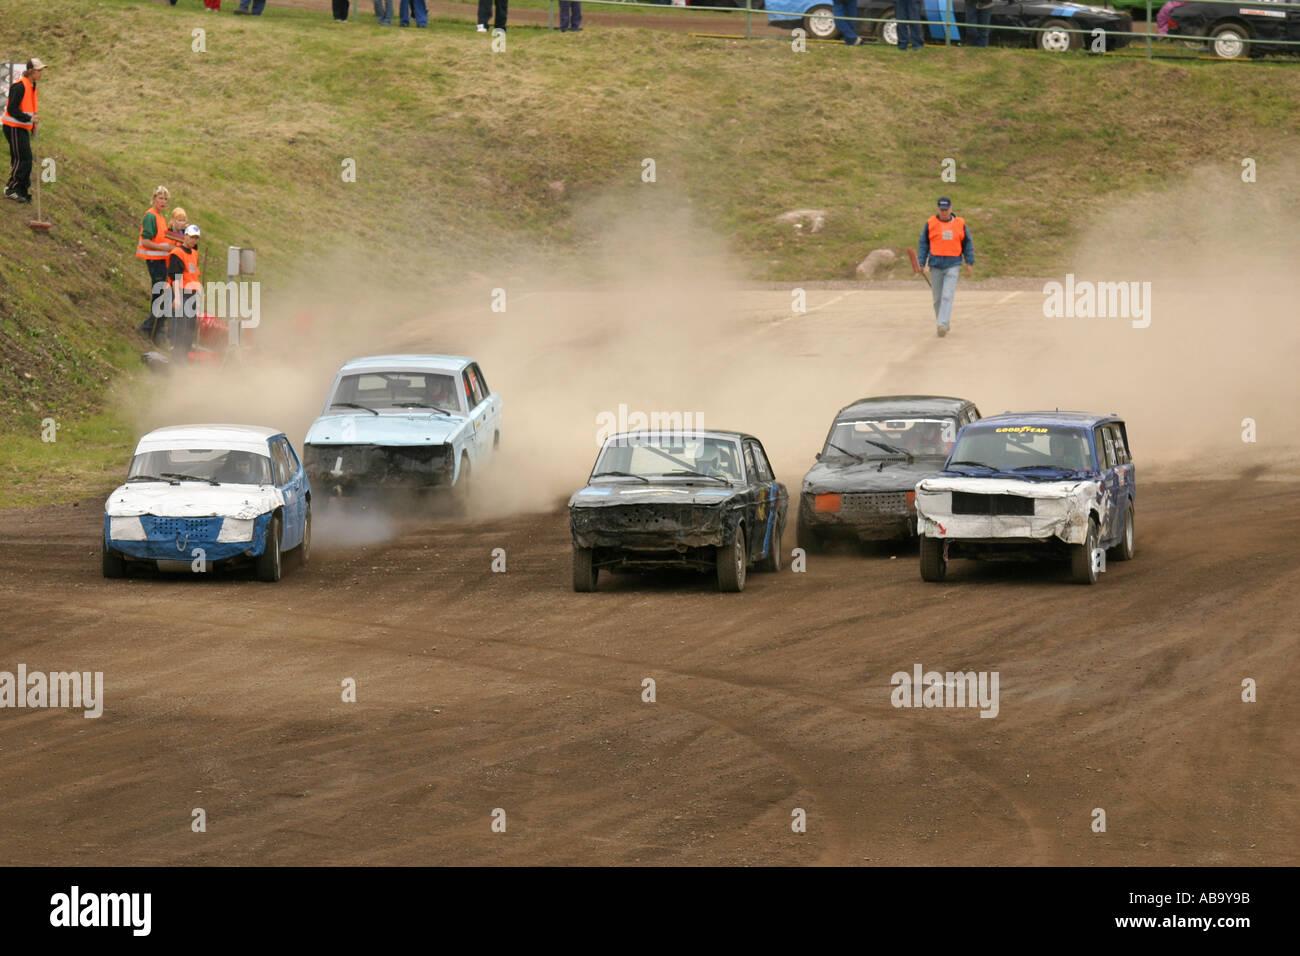 London To Mongolia Car Race